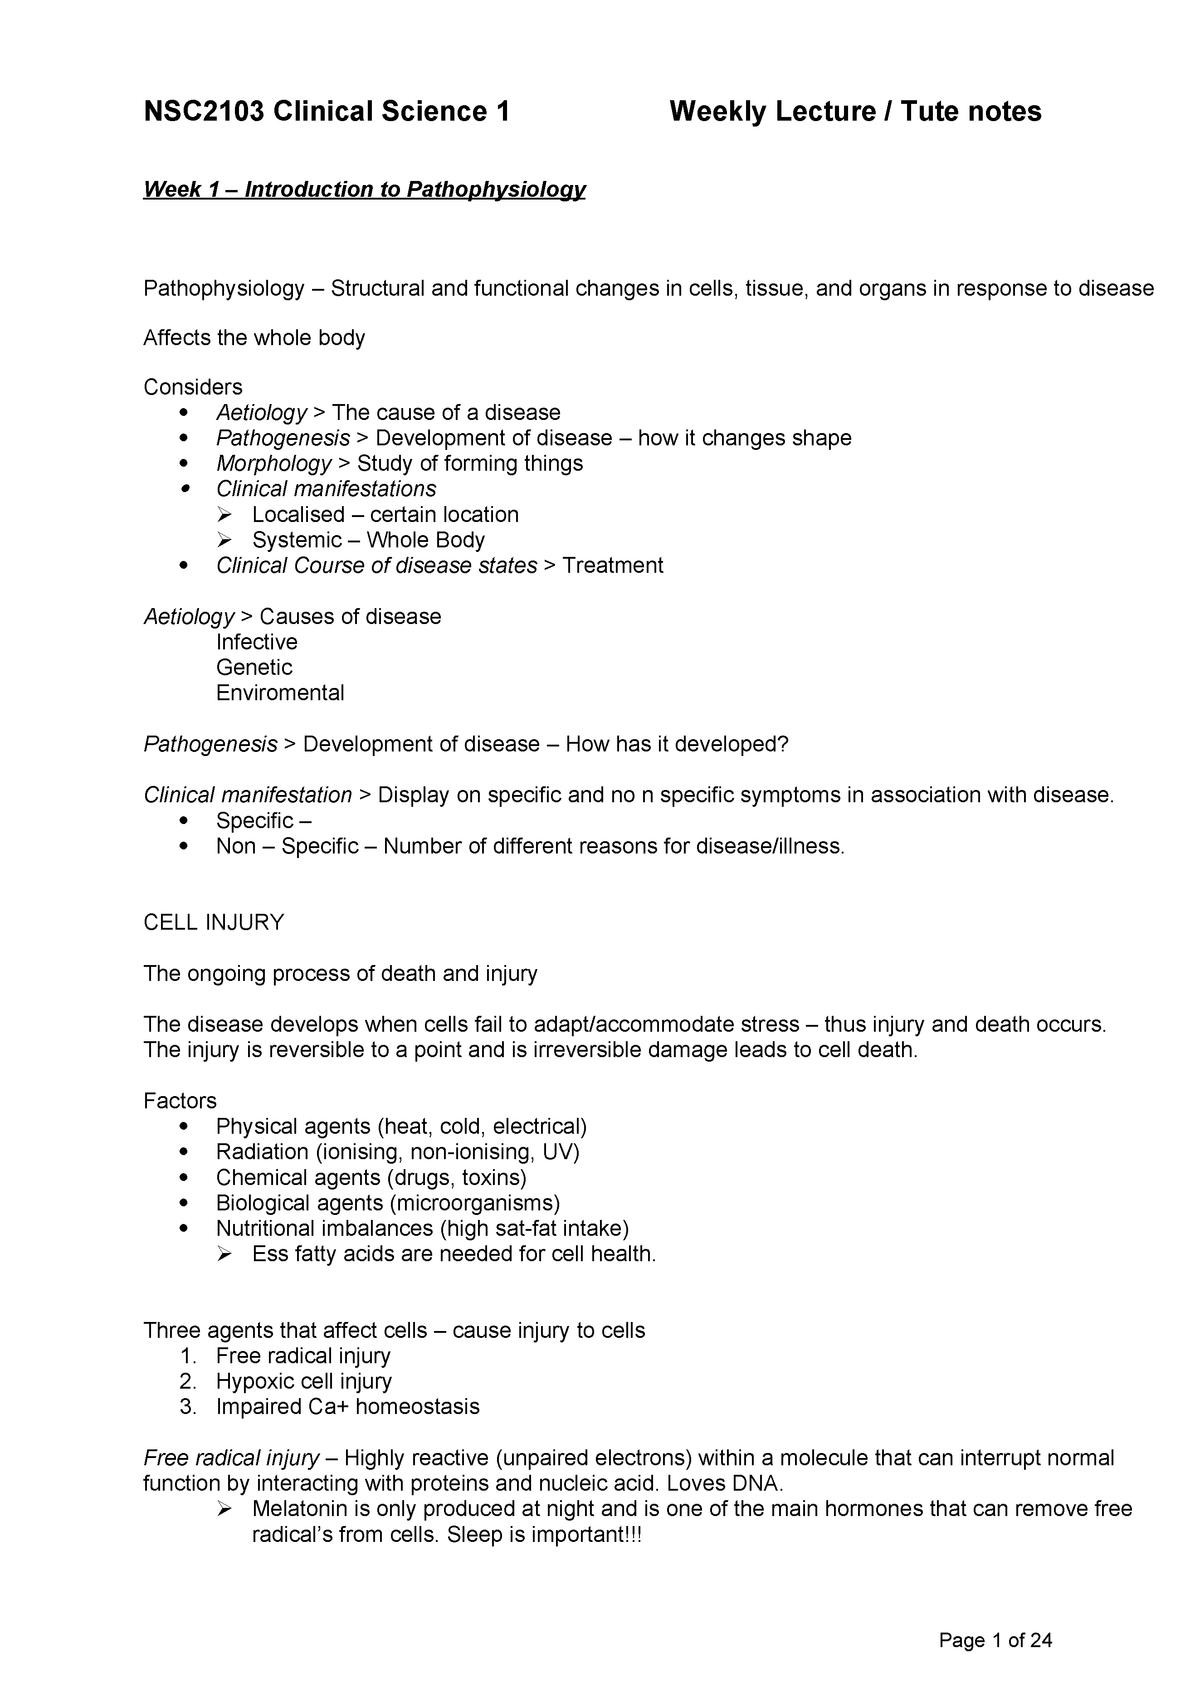 Clinical Science 1 Lecture notes - NCS2103 - ECU - StuDocu